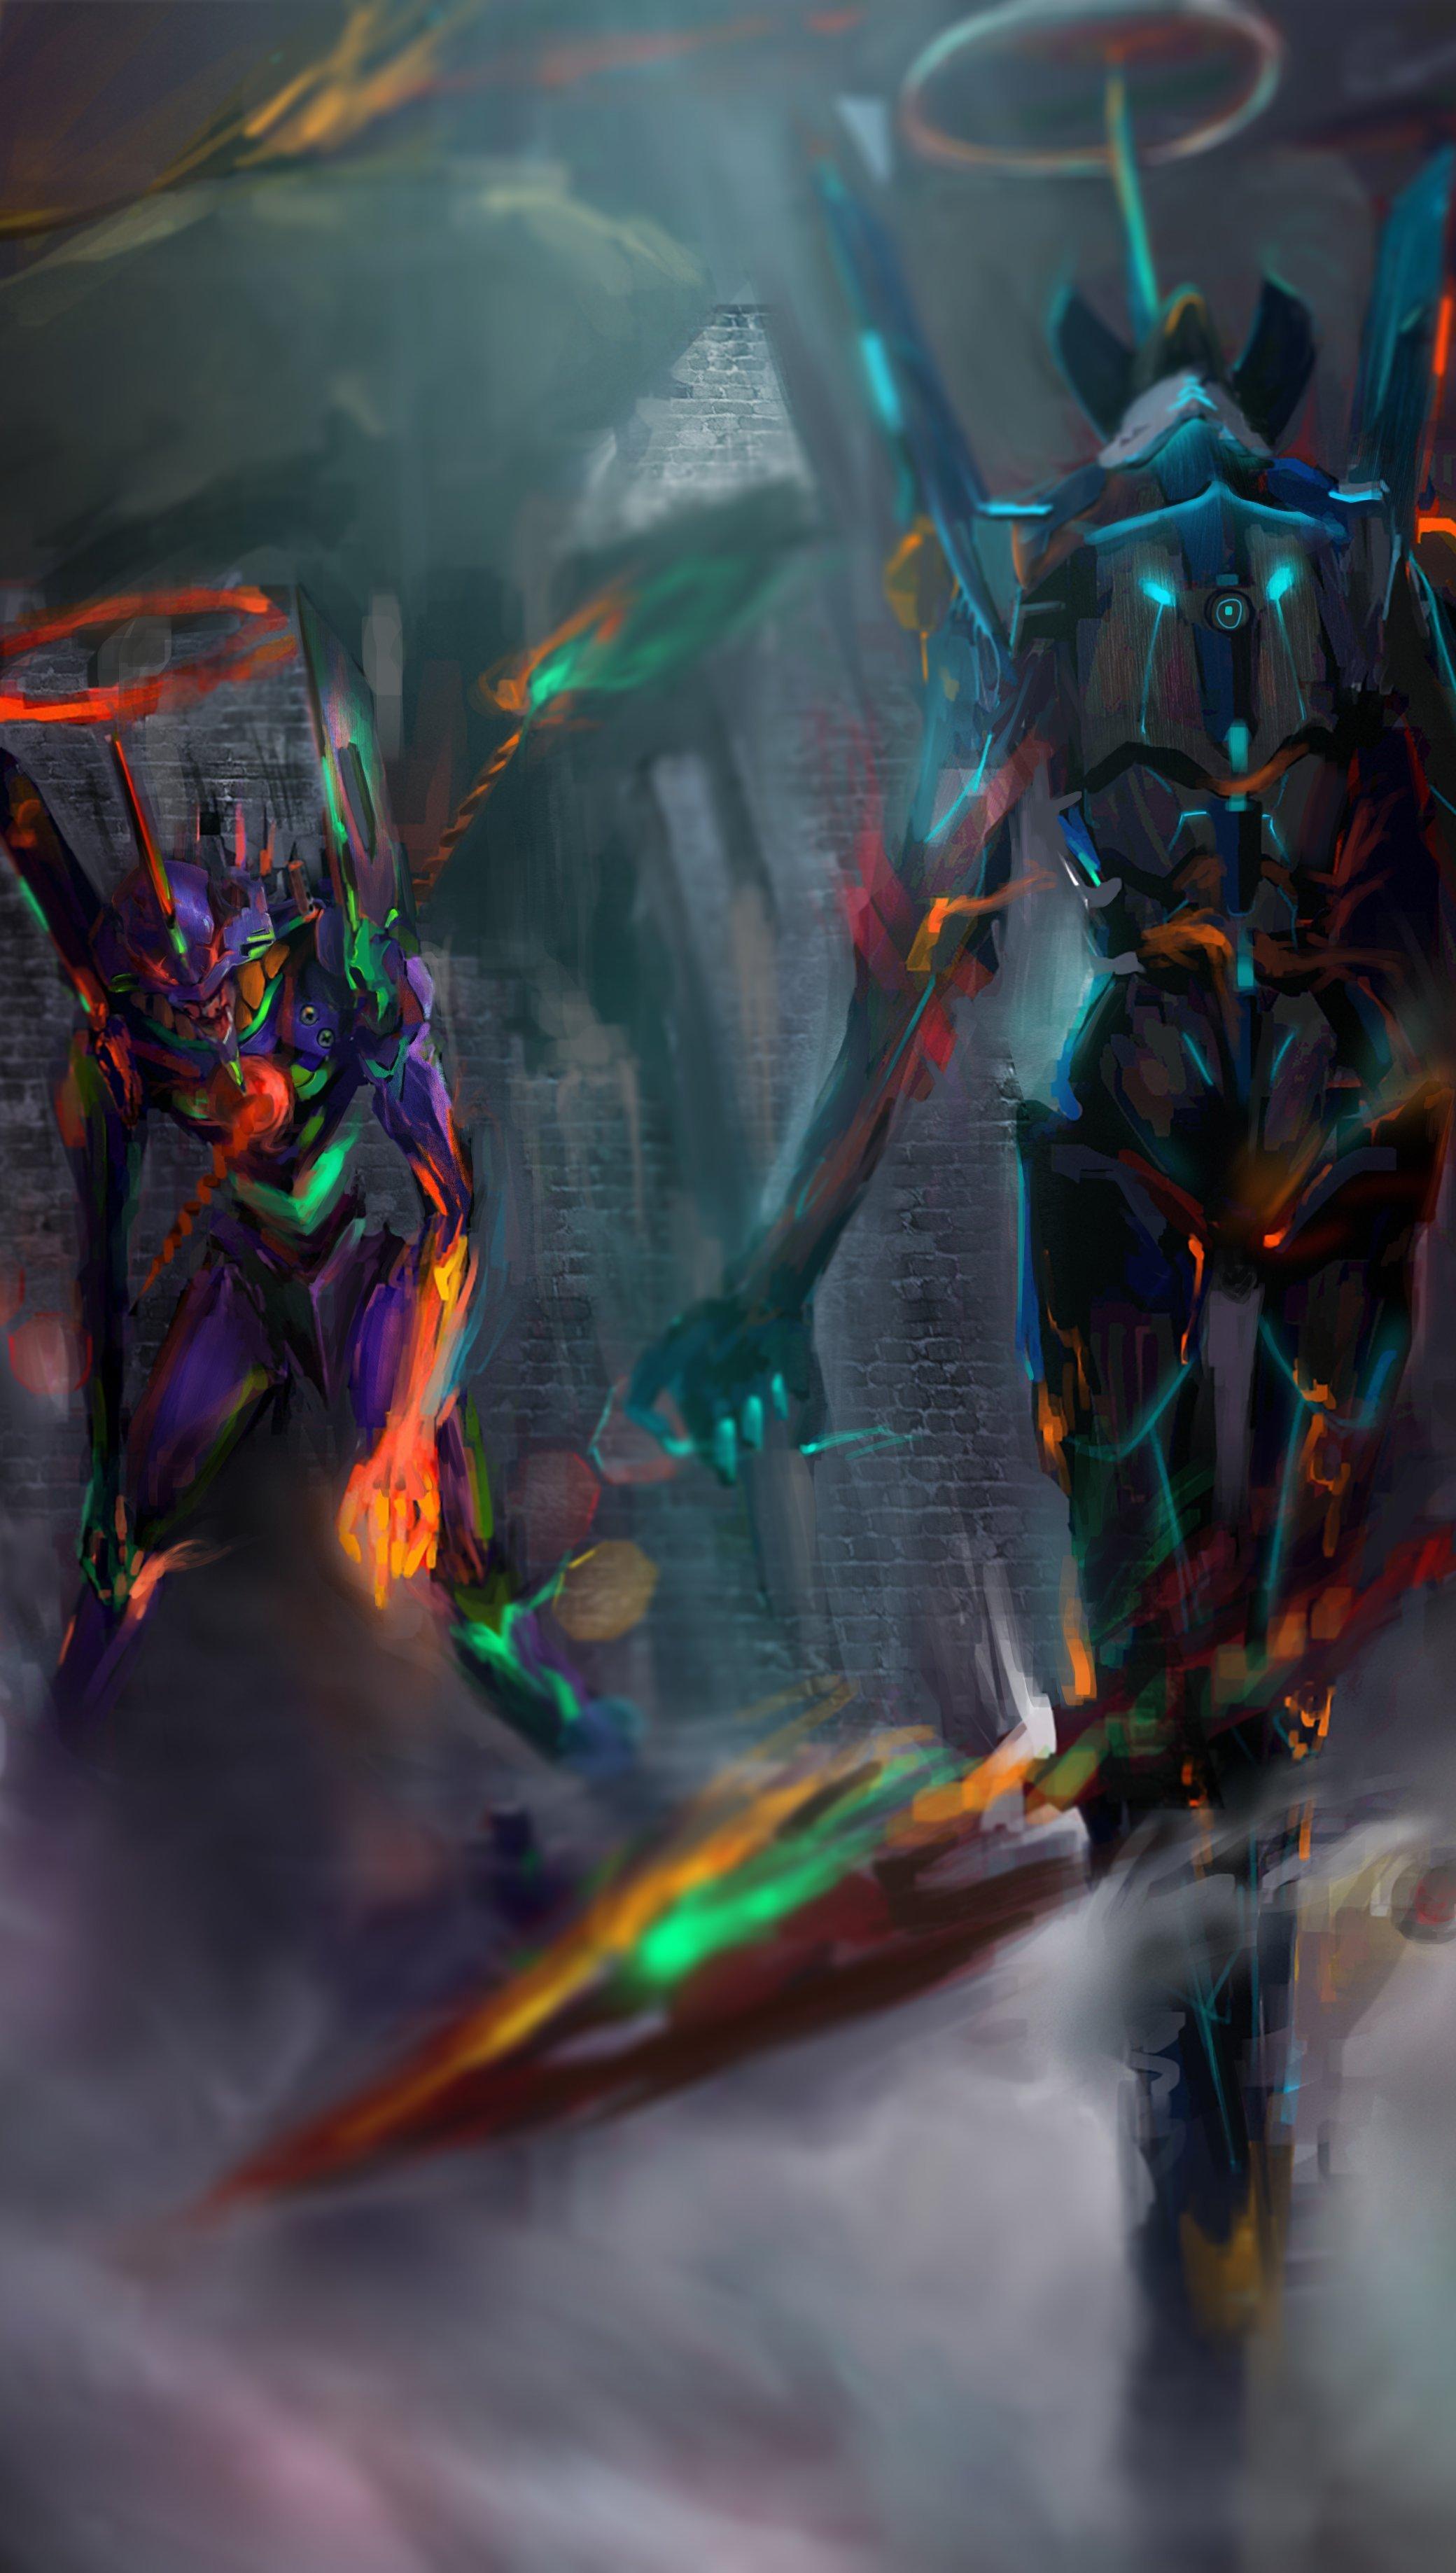 Anime Wallpaper Neon Genesis Evangelion Vertical